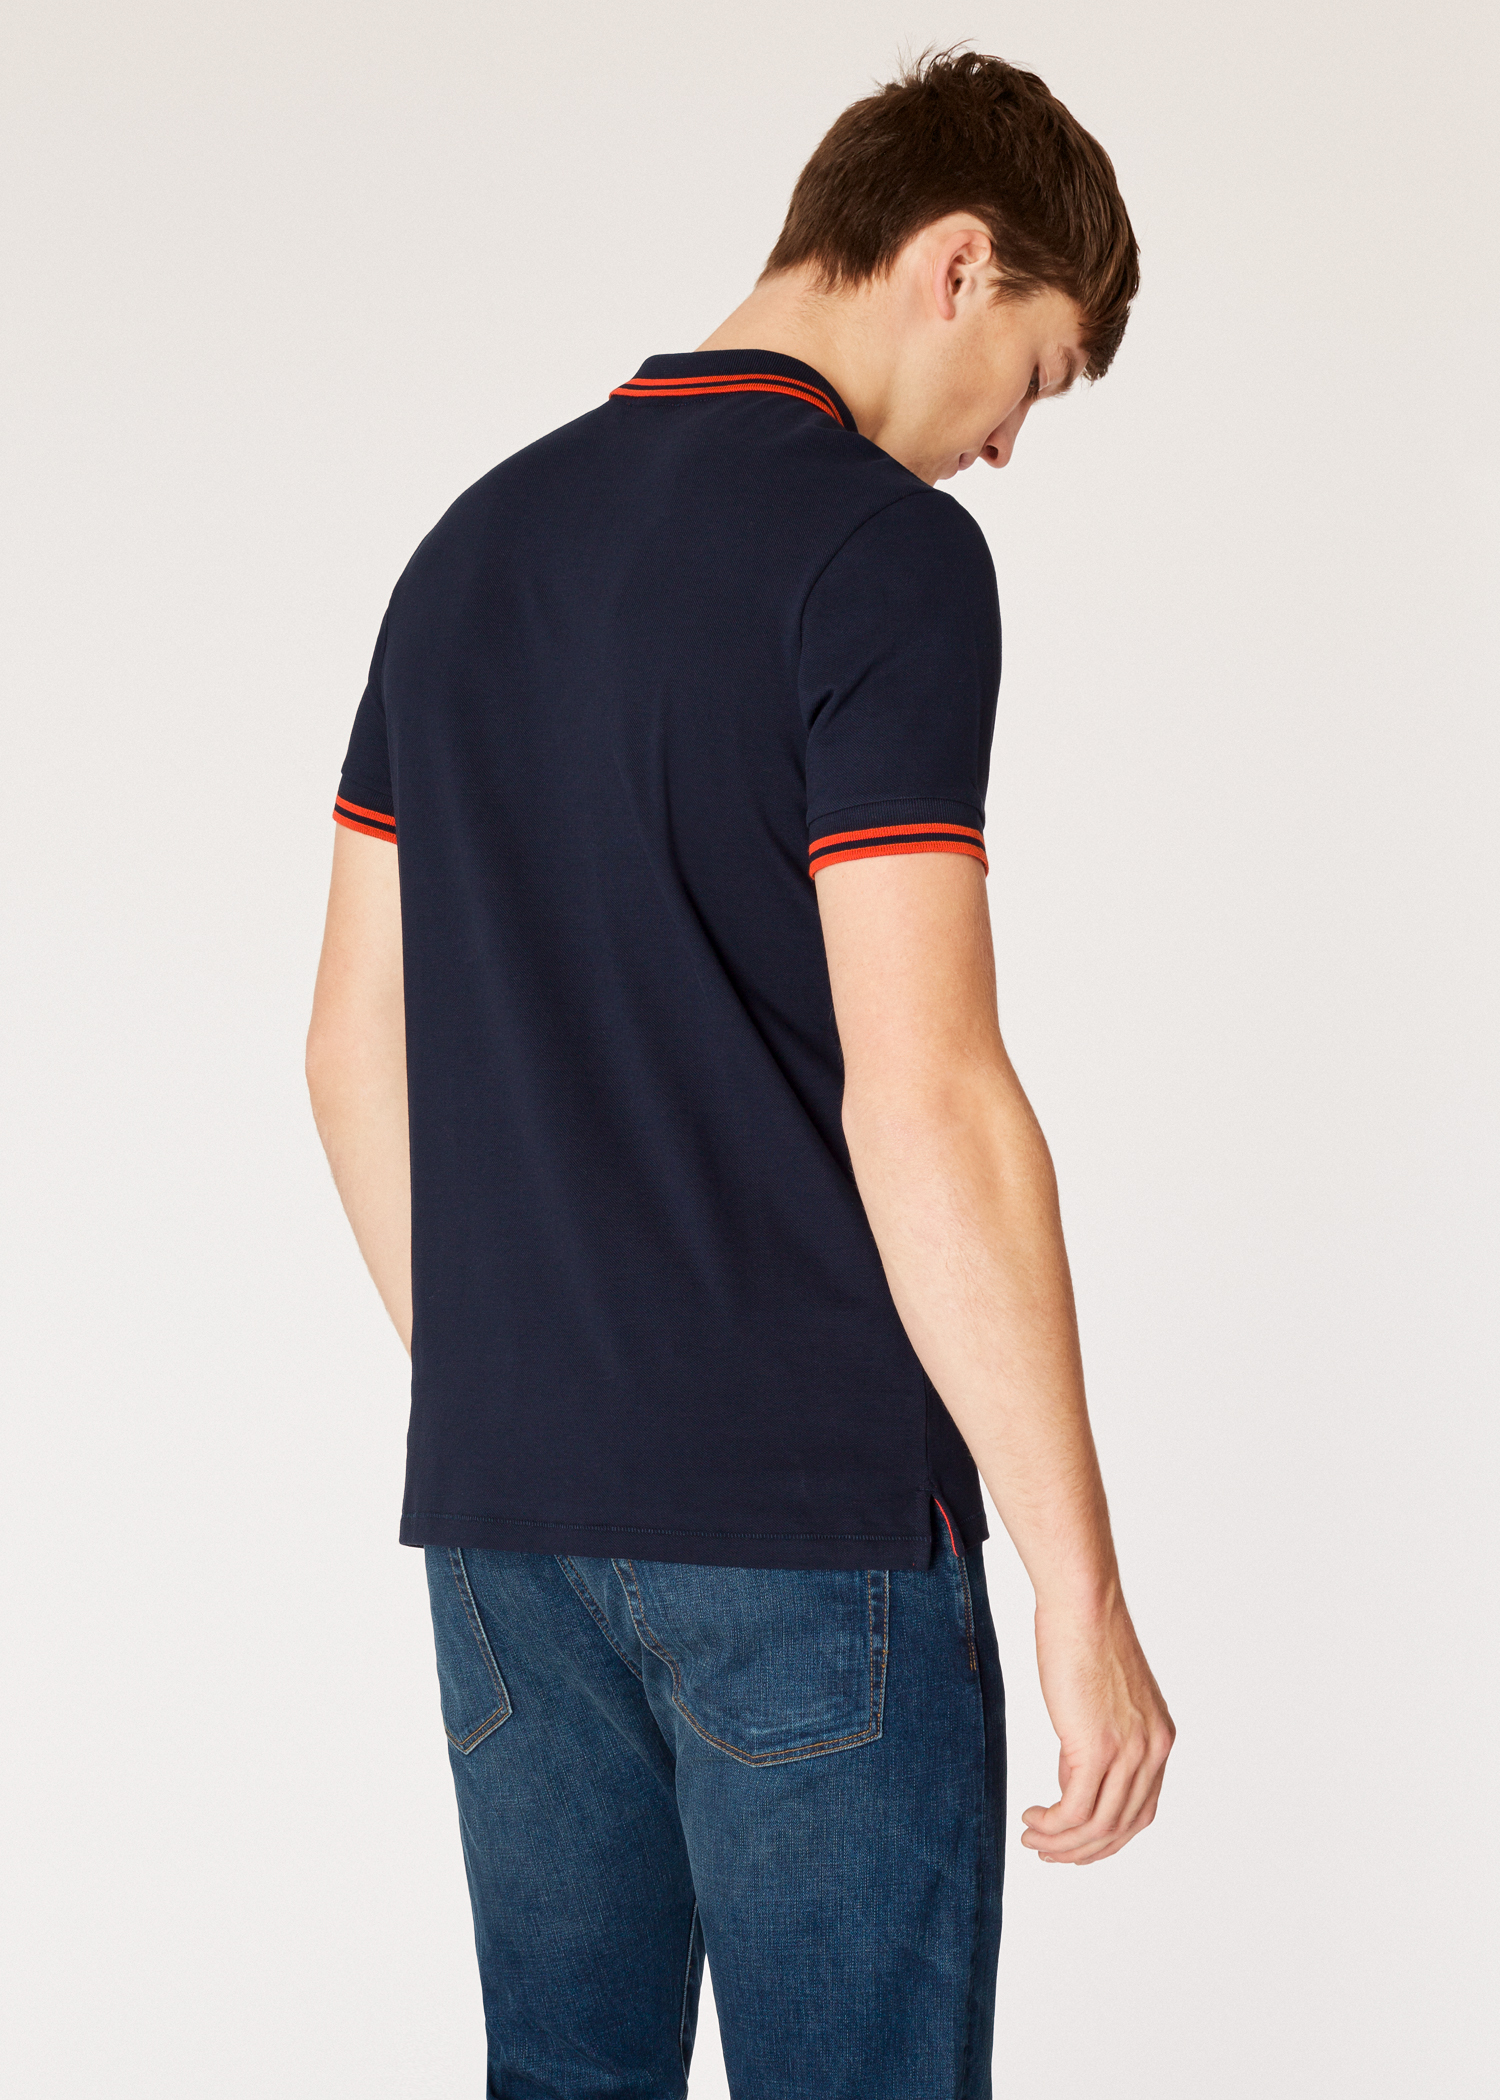 87be52d1462 Model back close up - Men's Slim-Fit Dark Navy Zebra Polo Shirt With Orange